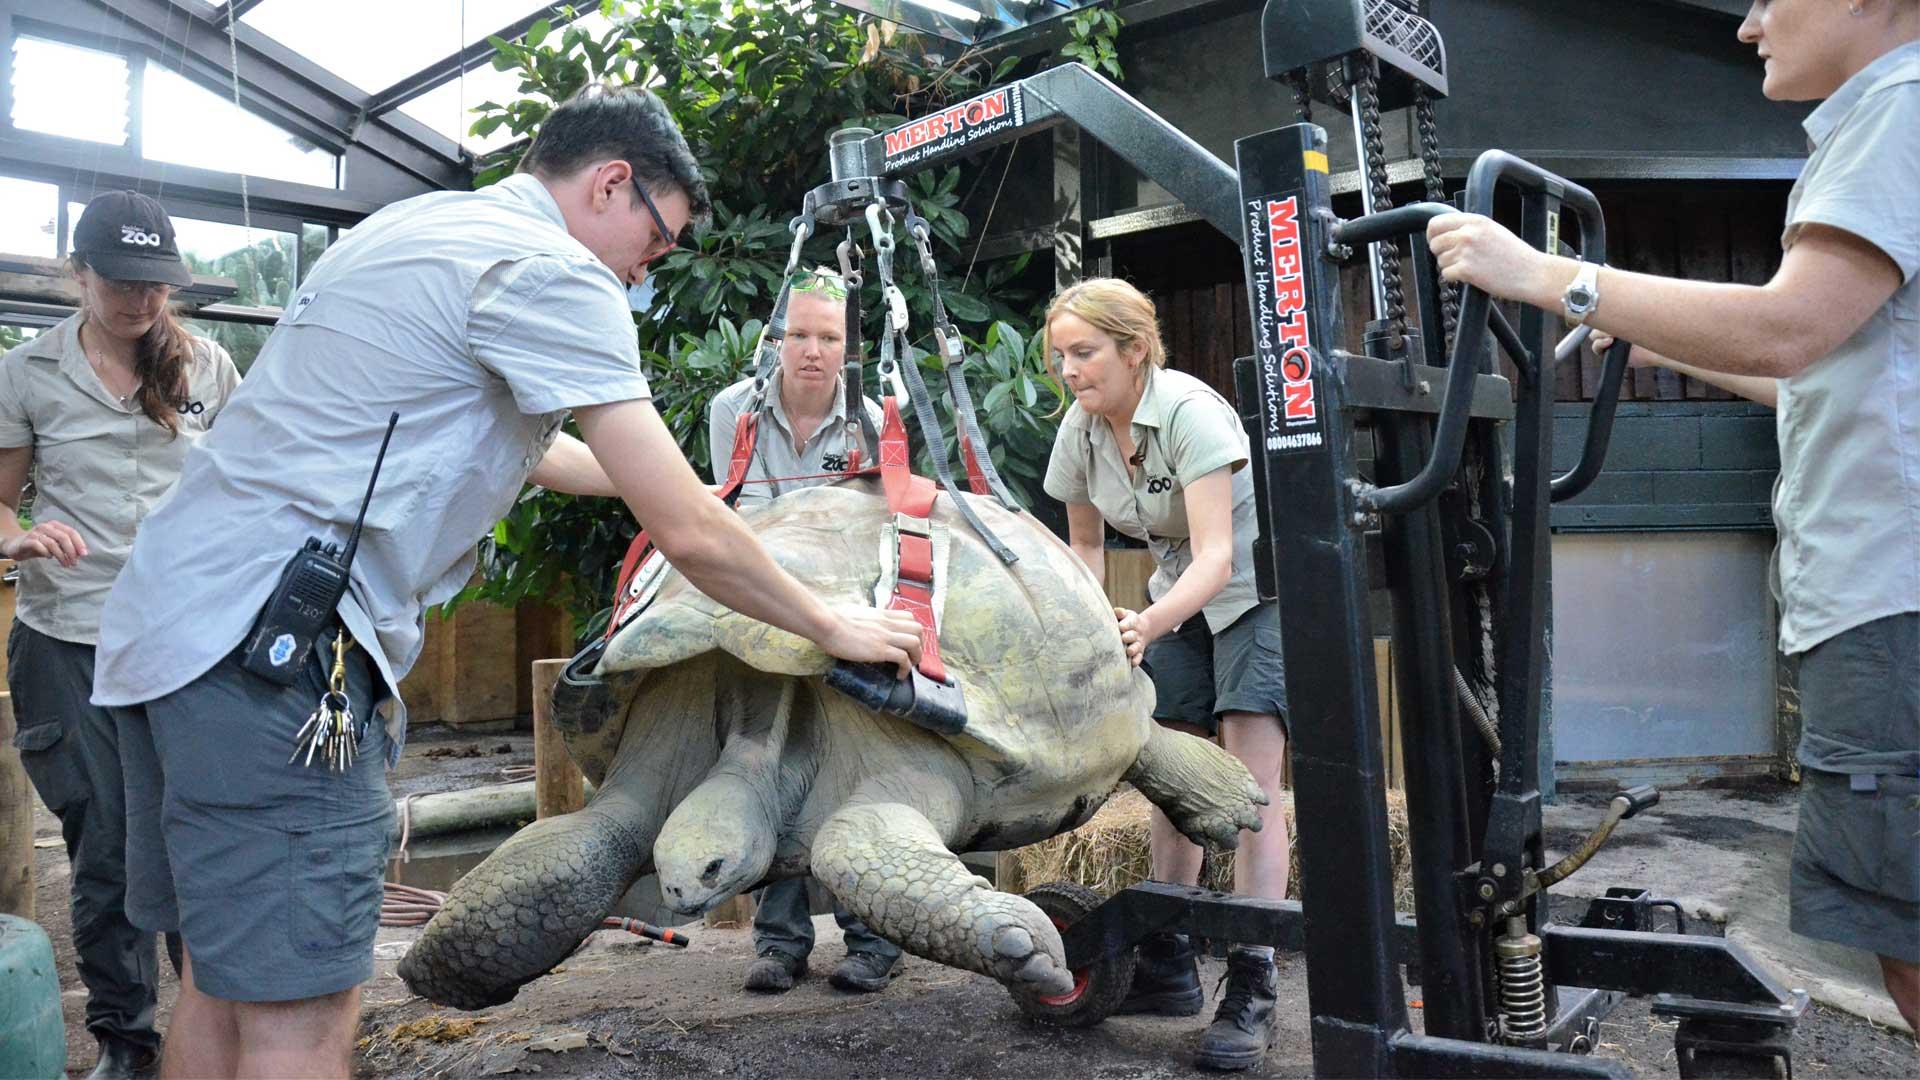 https://rfacdn.nz/zoo/assets/media/galapagos-tortoise-xray-gallery-3.jpg